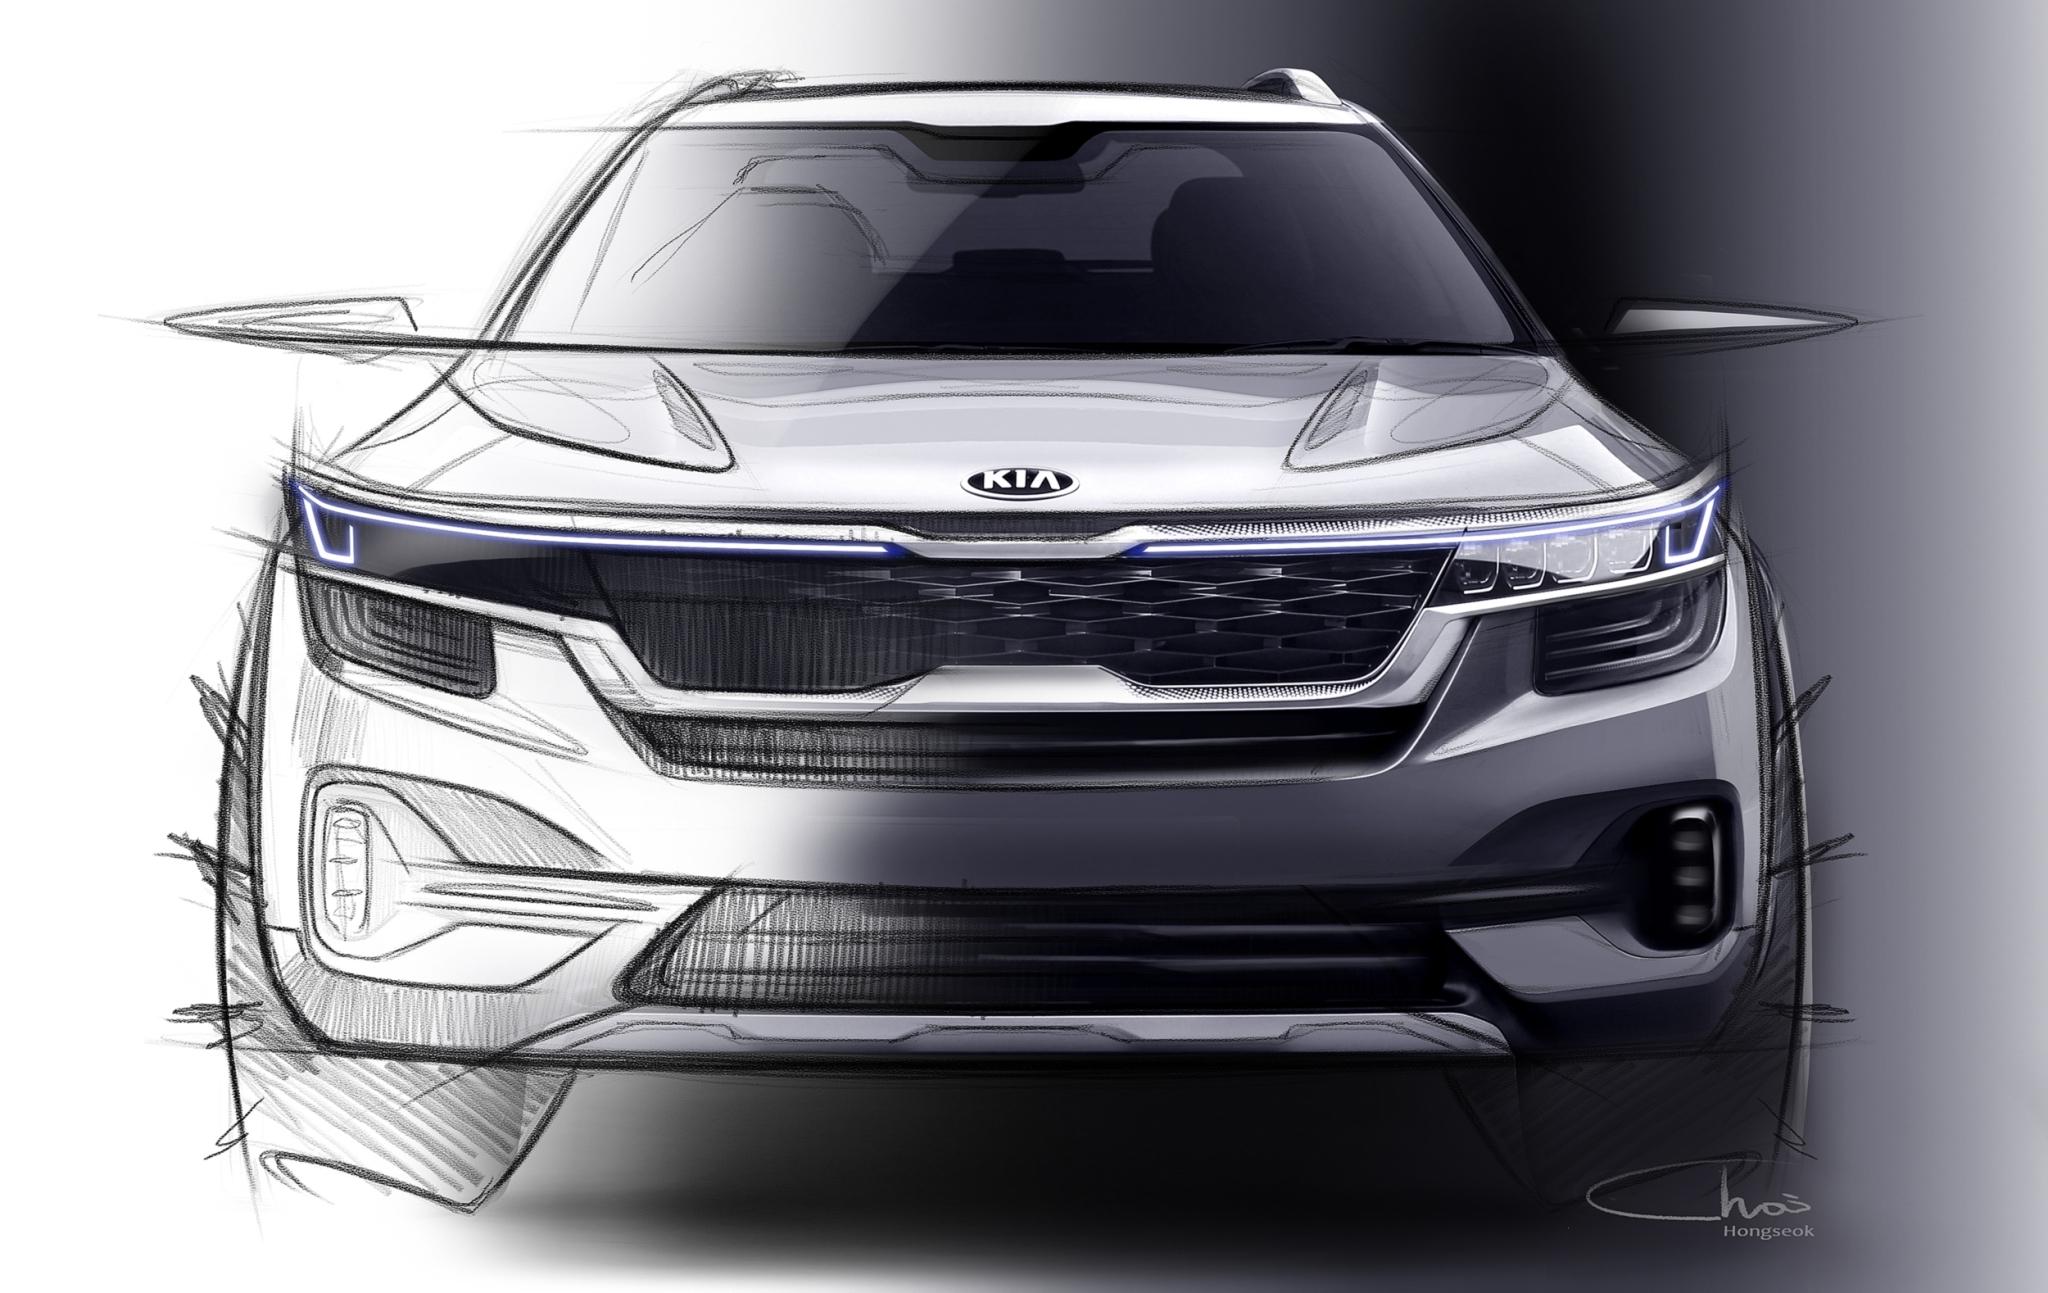 Kia Reveals Design of SP Concept-Based SUV in Sketches